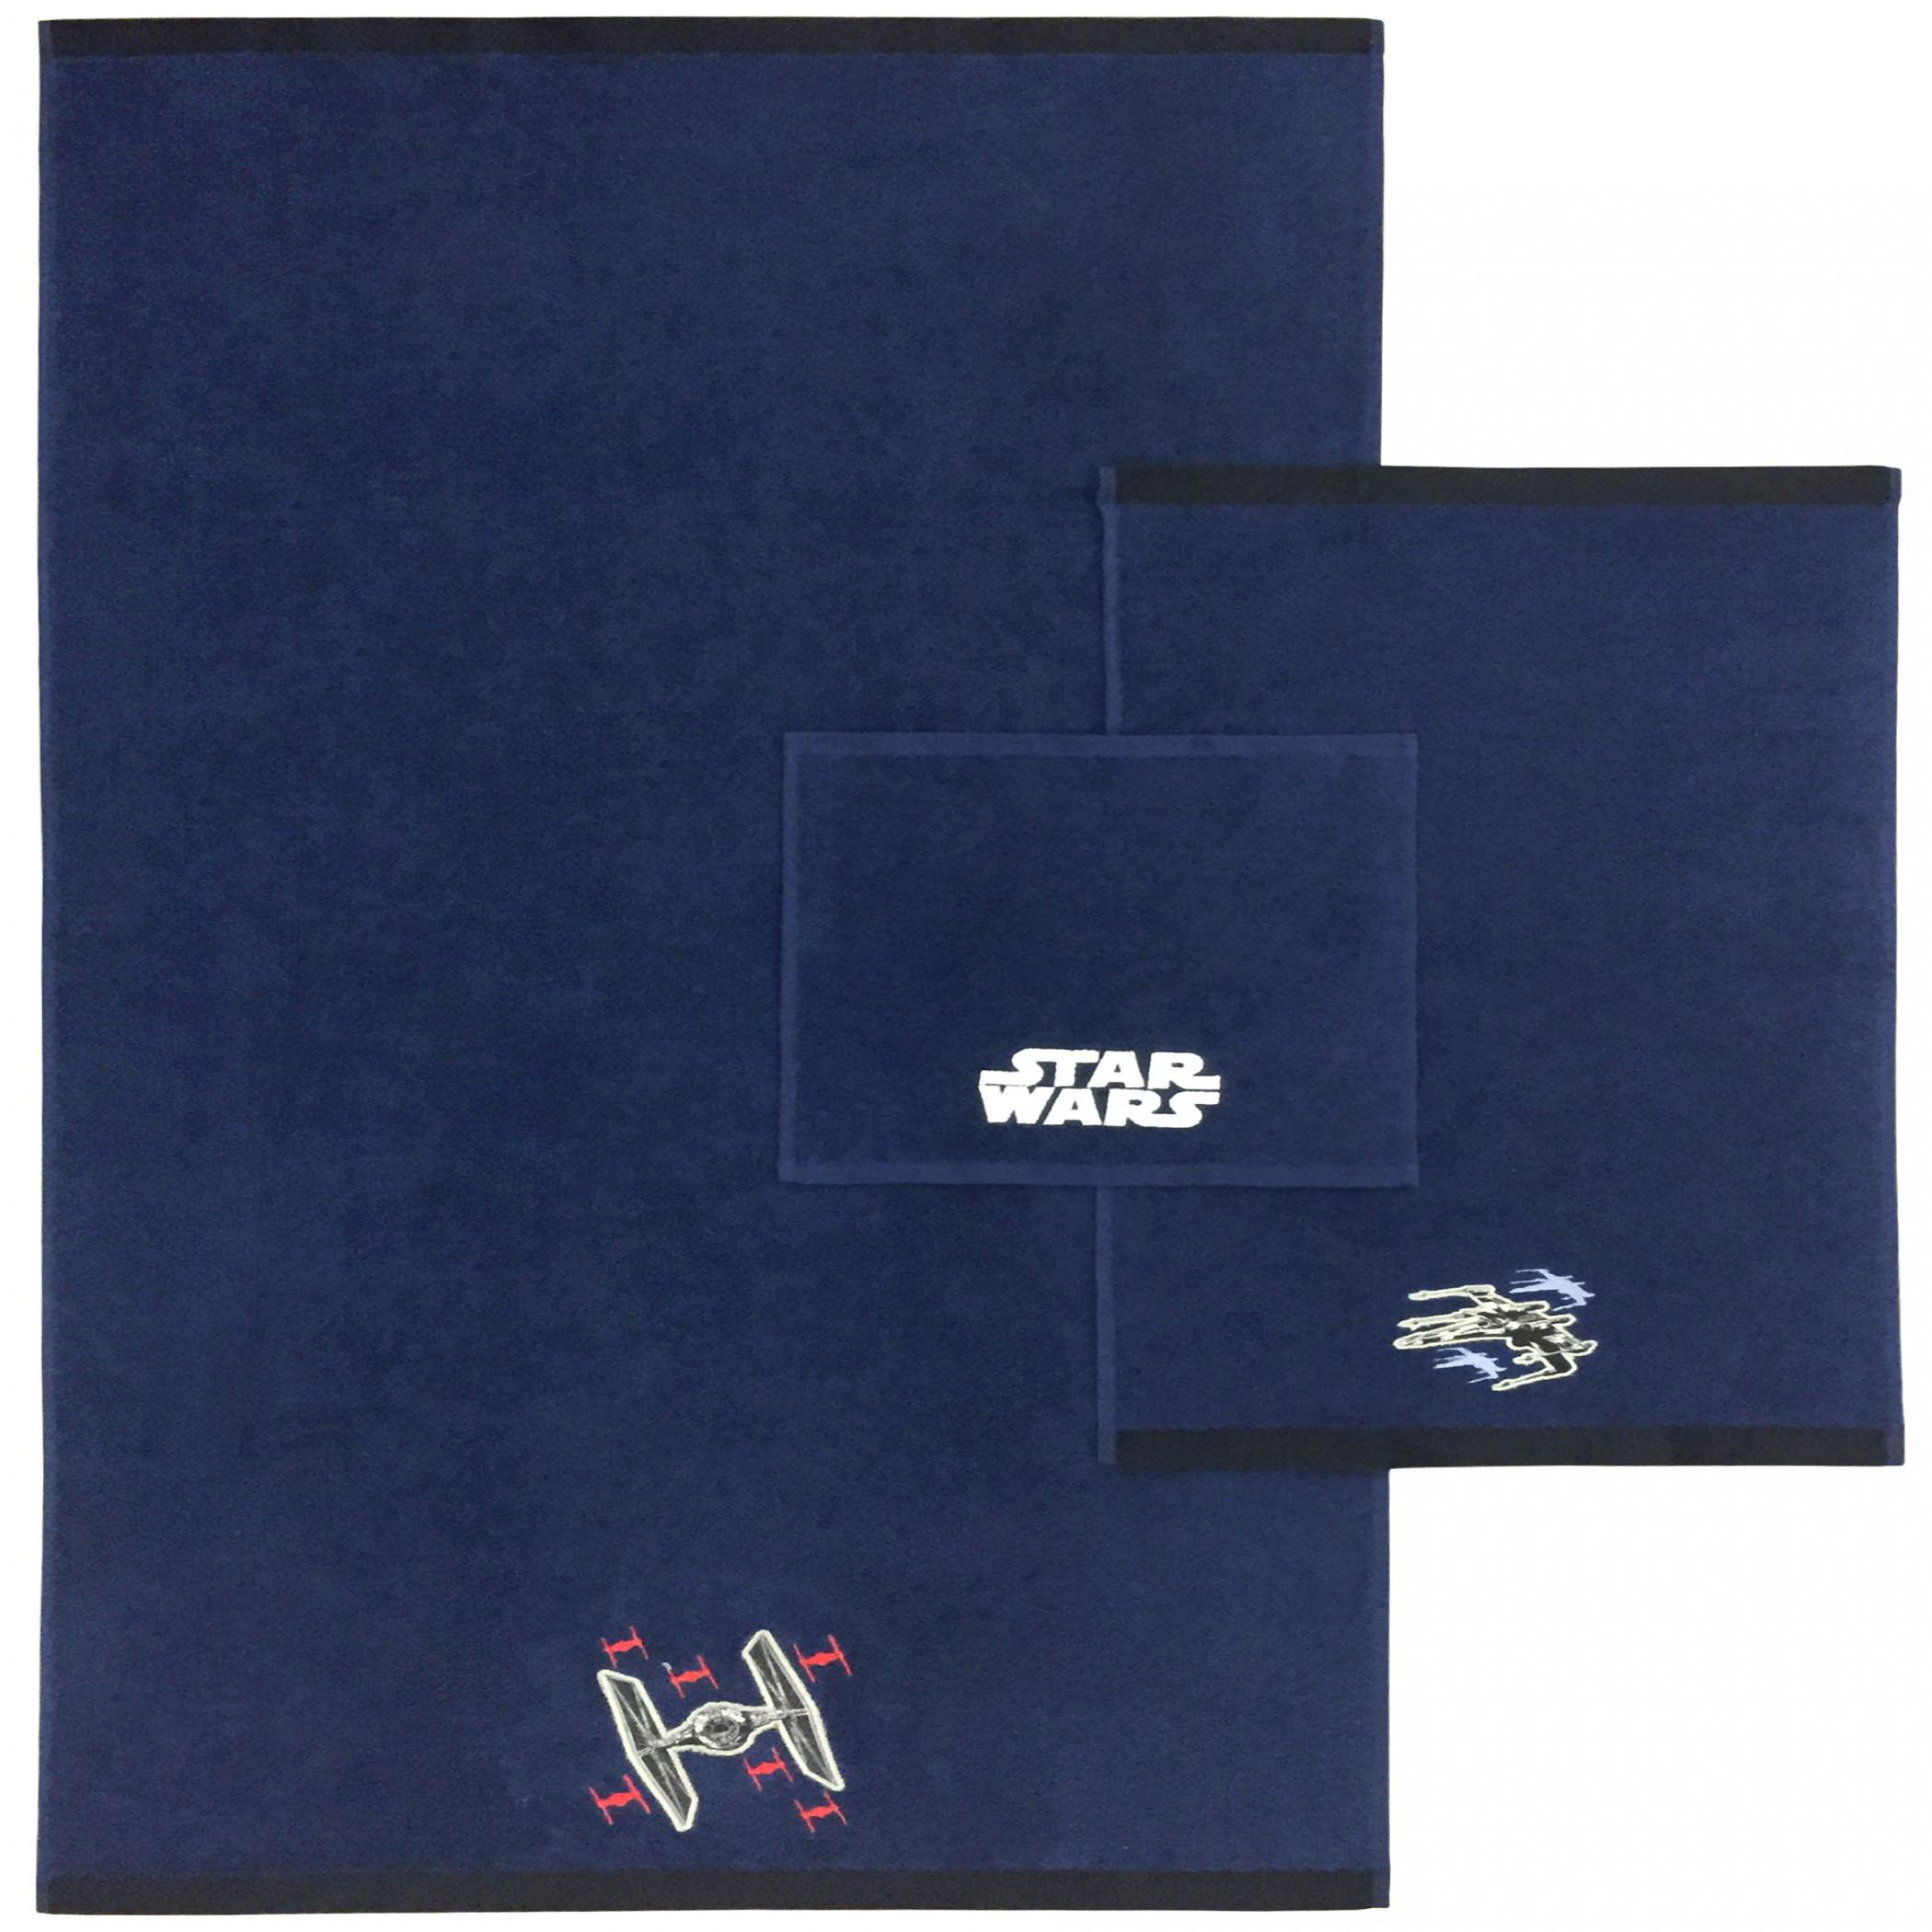 Star Wars 3-Piece Bath Towel Set